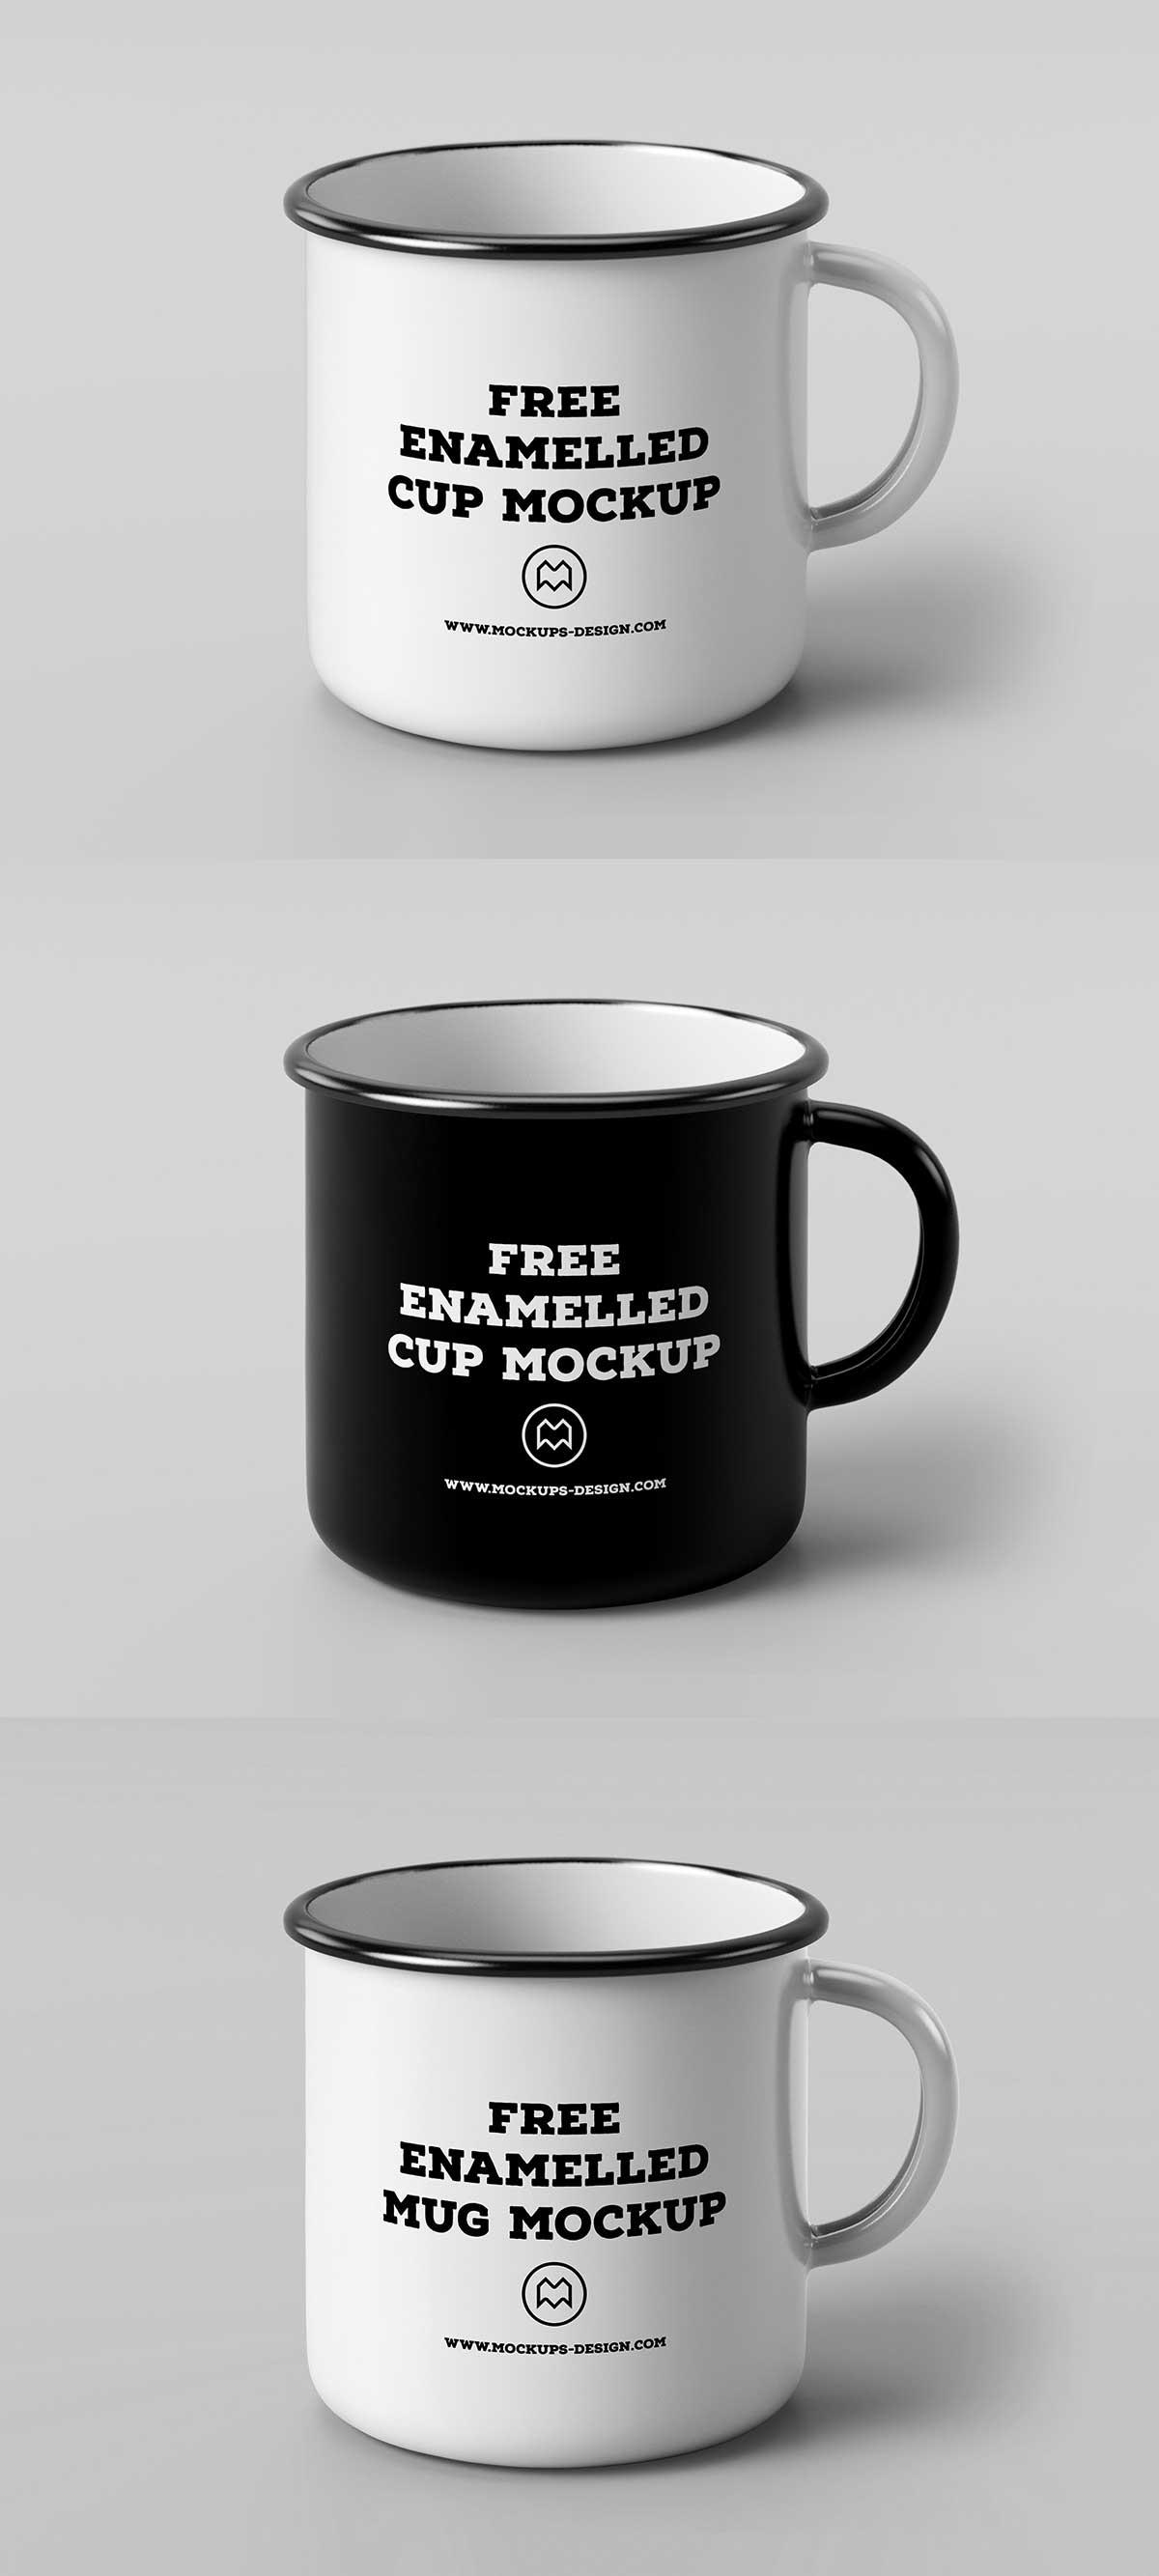 Free Enamel Mug Mockup Psd